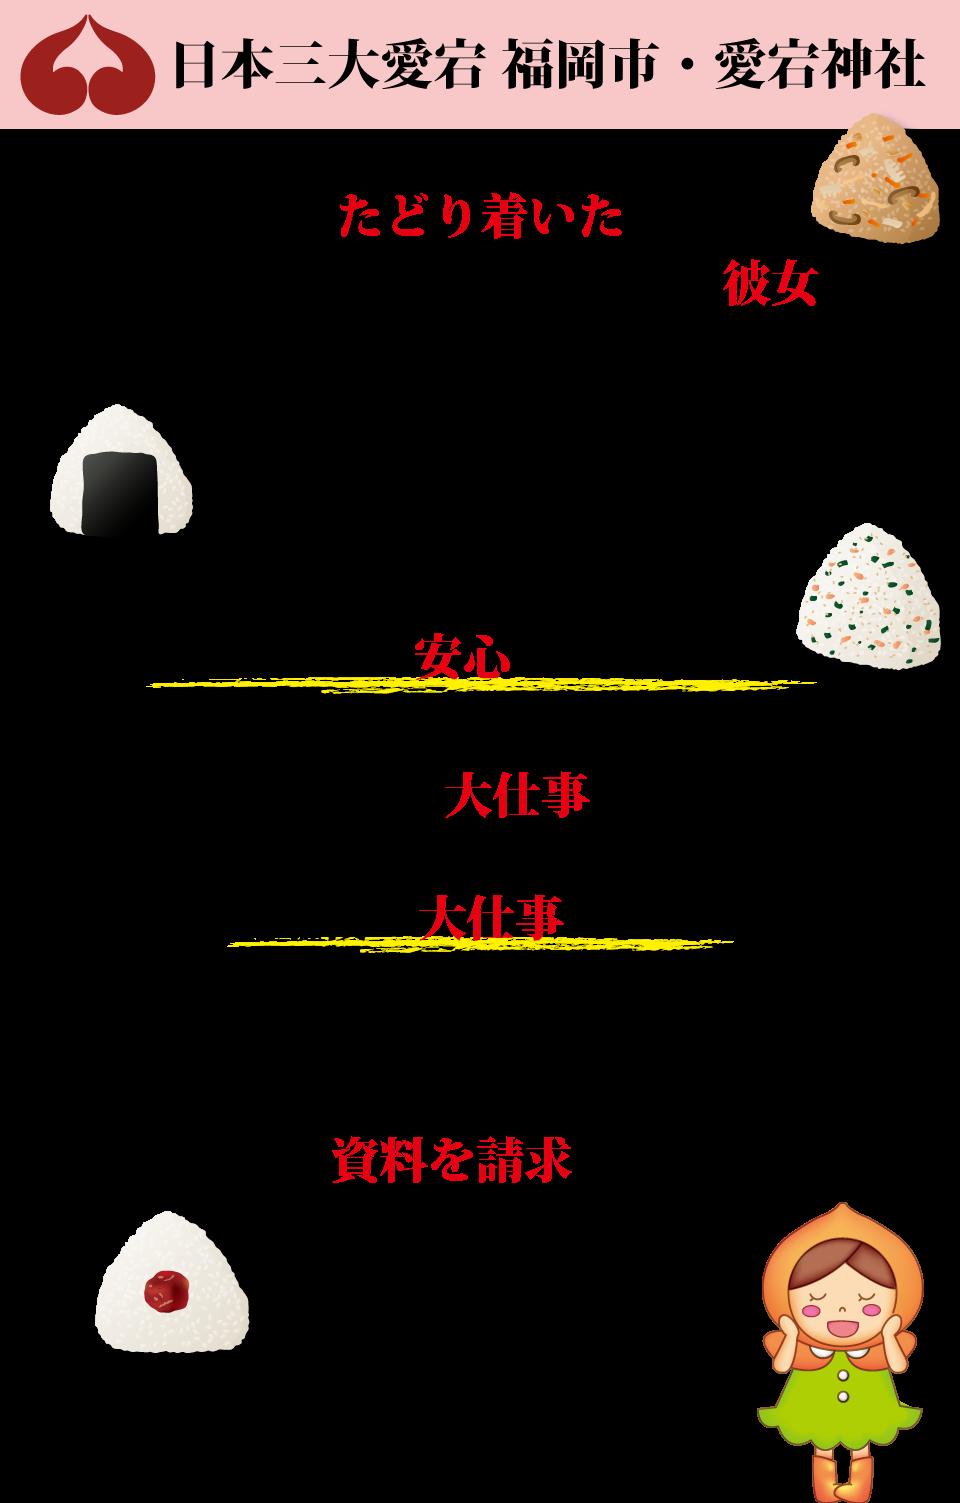 hiroshima_fm_1_temp